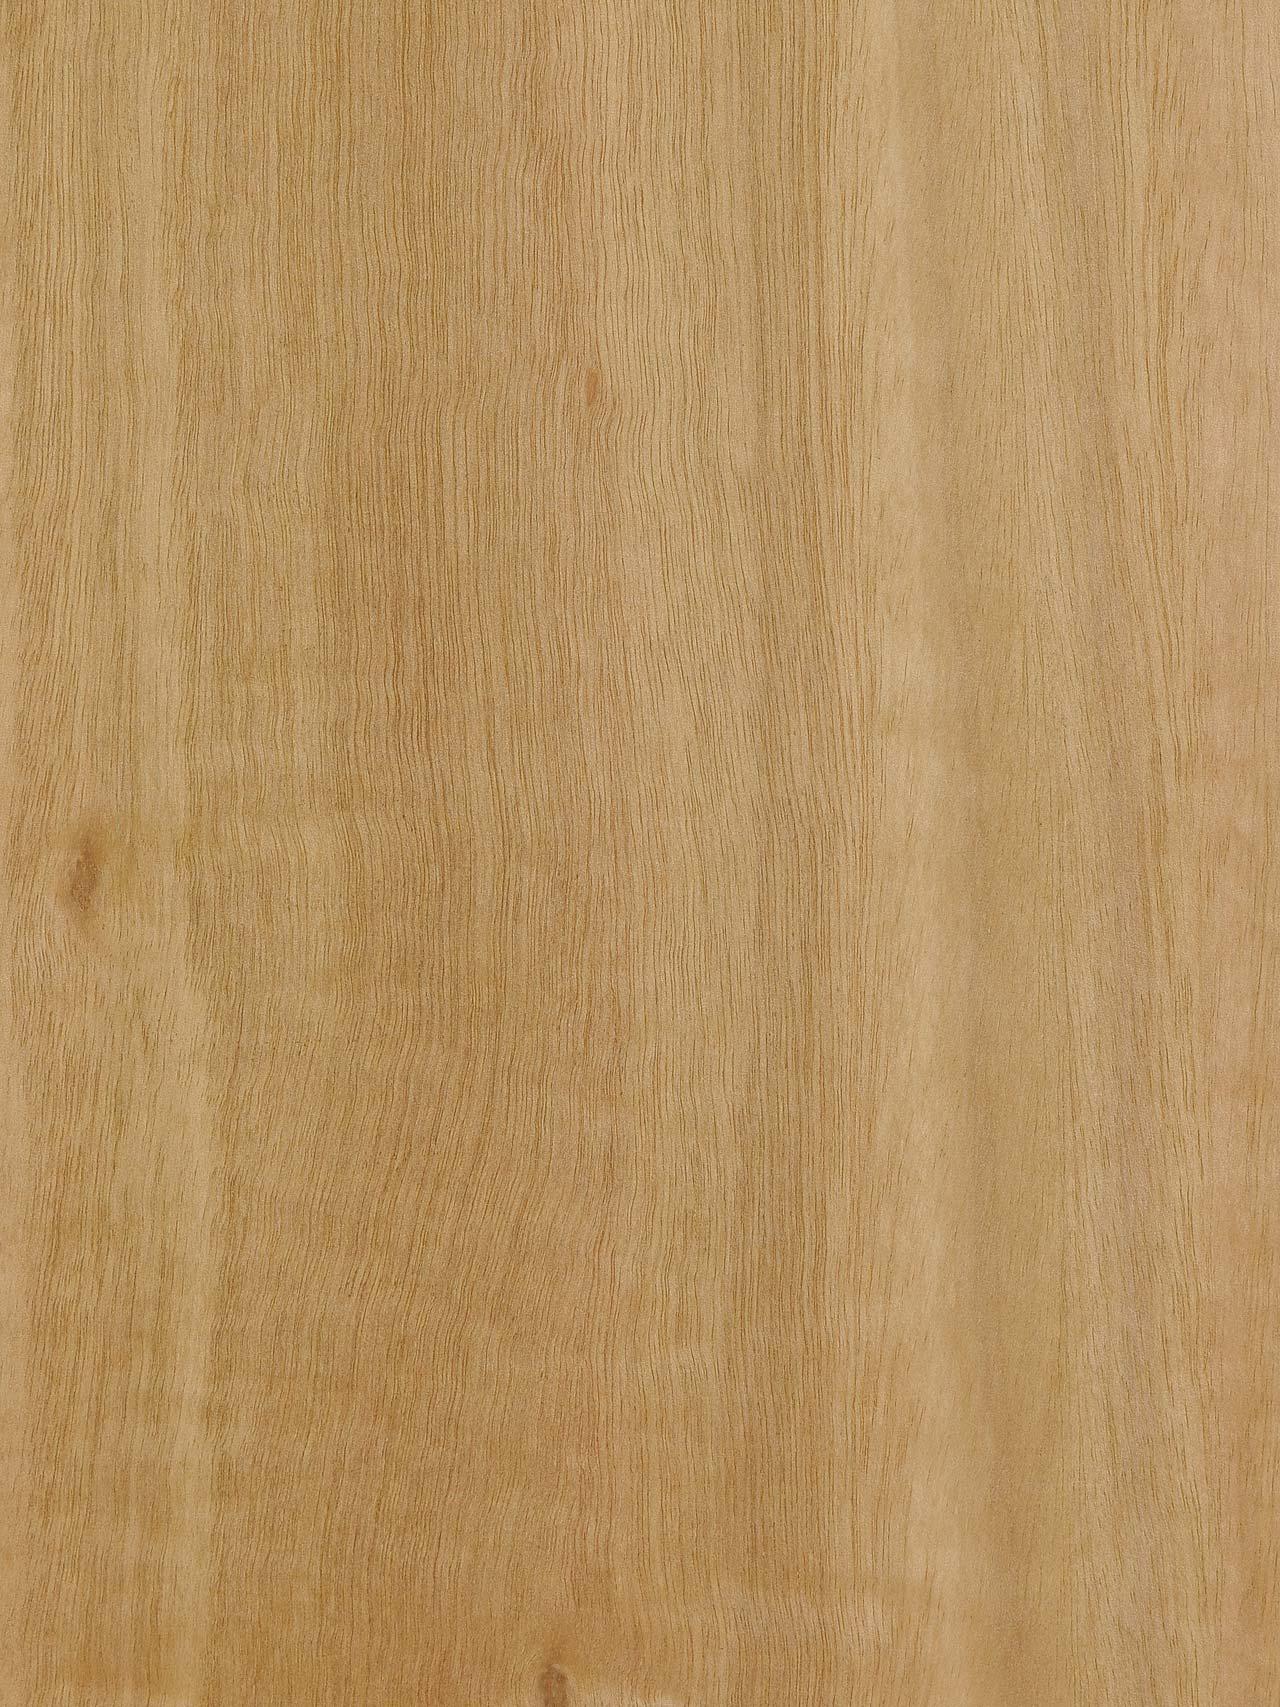 Chapa Eucalipto Rameado Losán